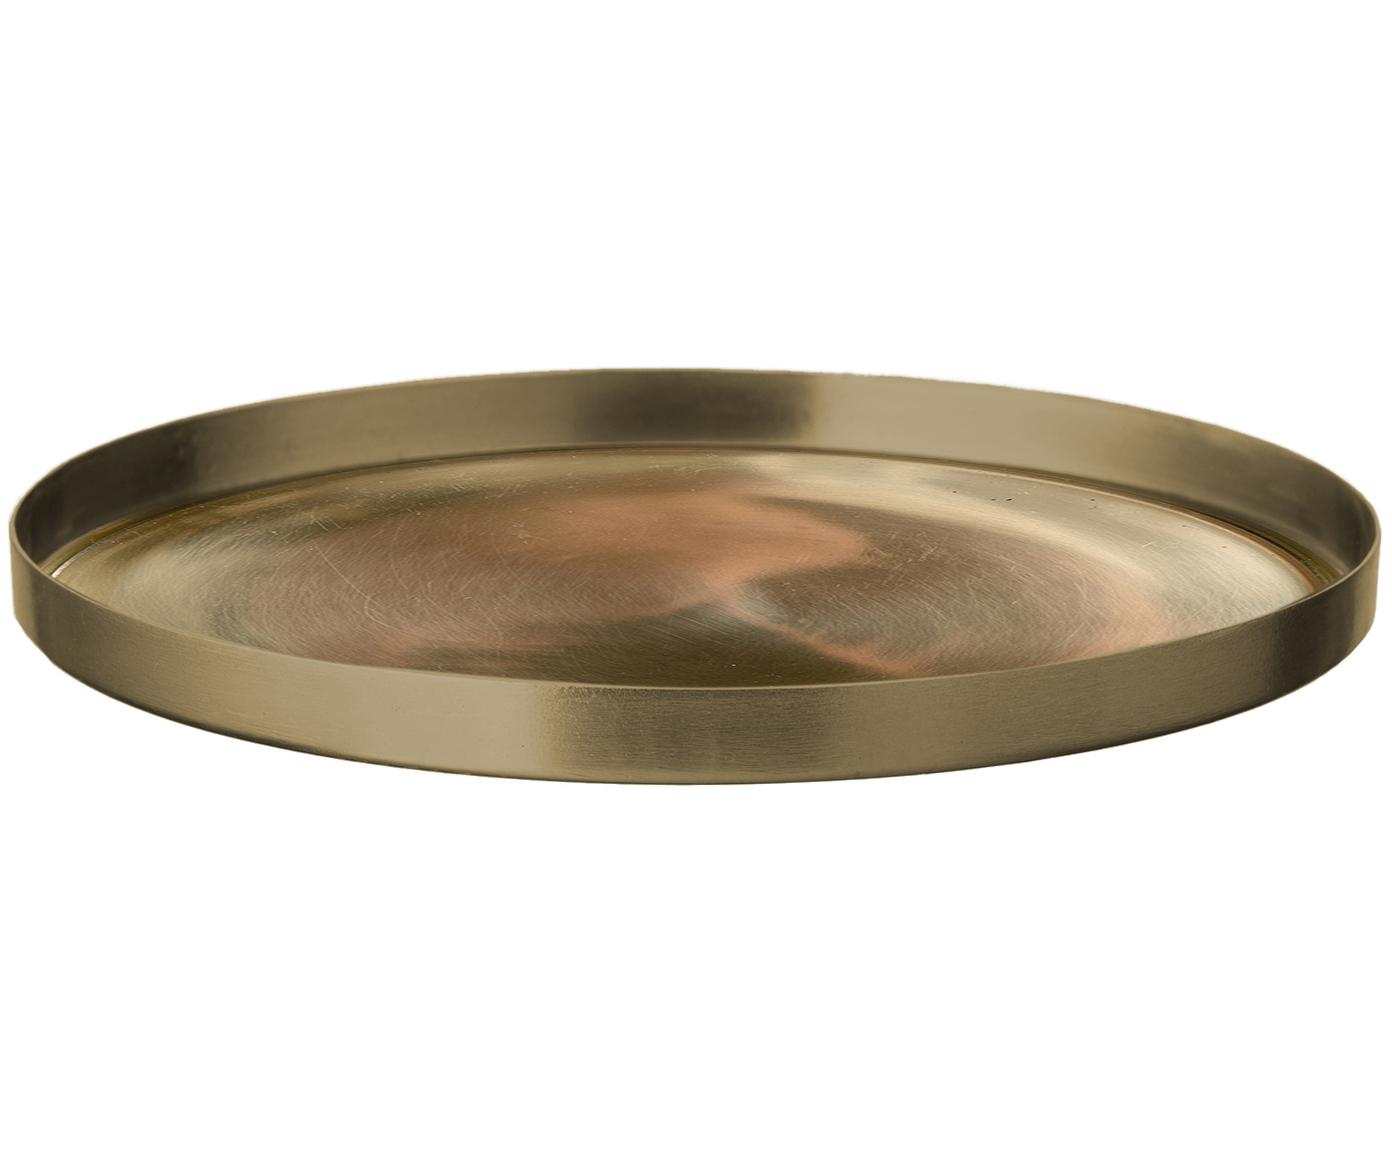 Deko-Tablett Udine, Stahl, vermessingt, Messing, Ø 15 x H 1 cm